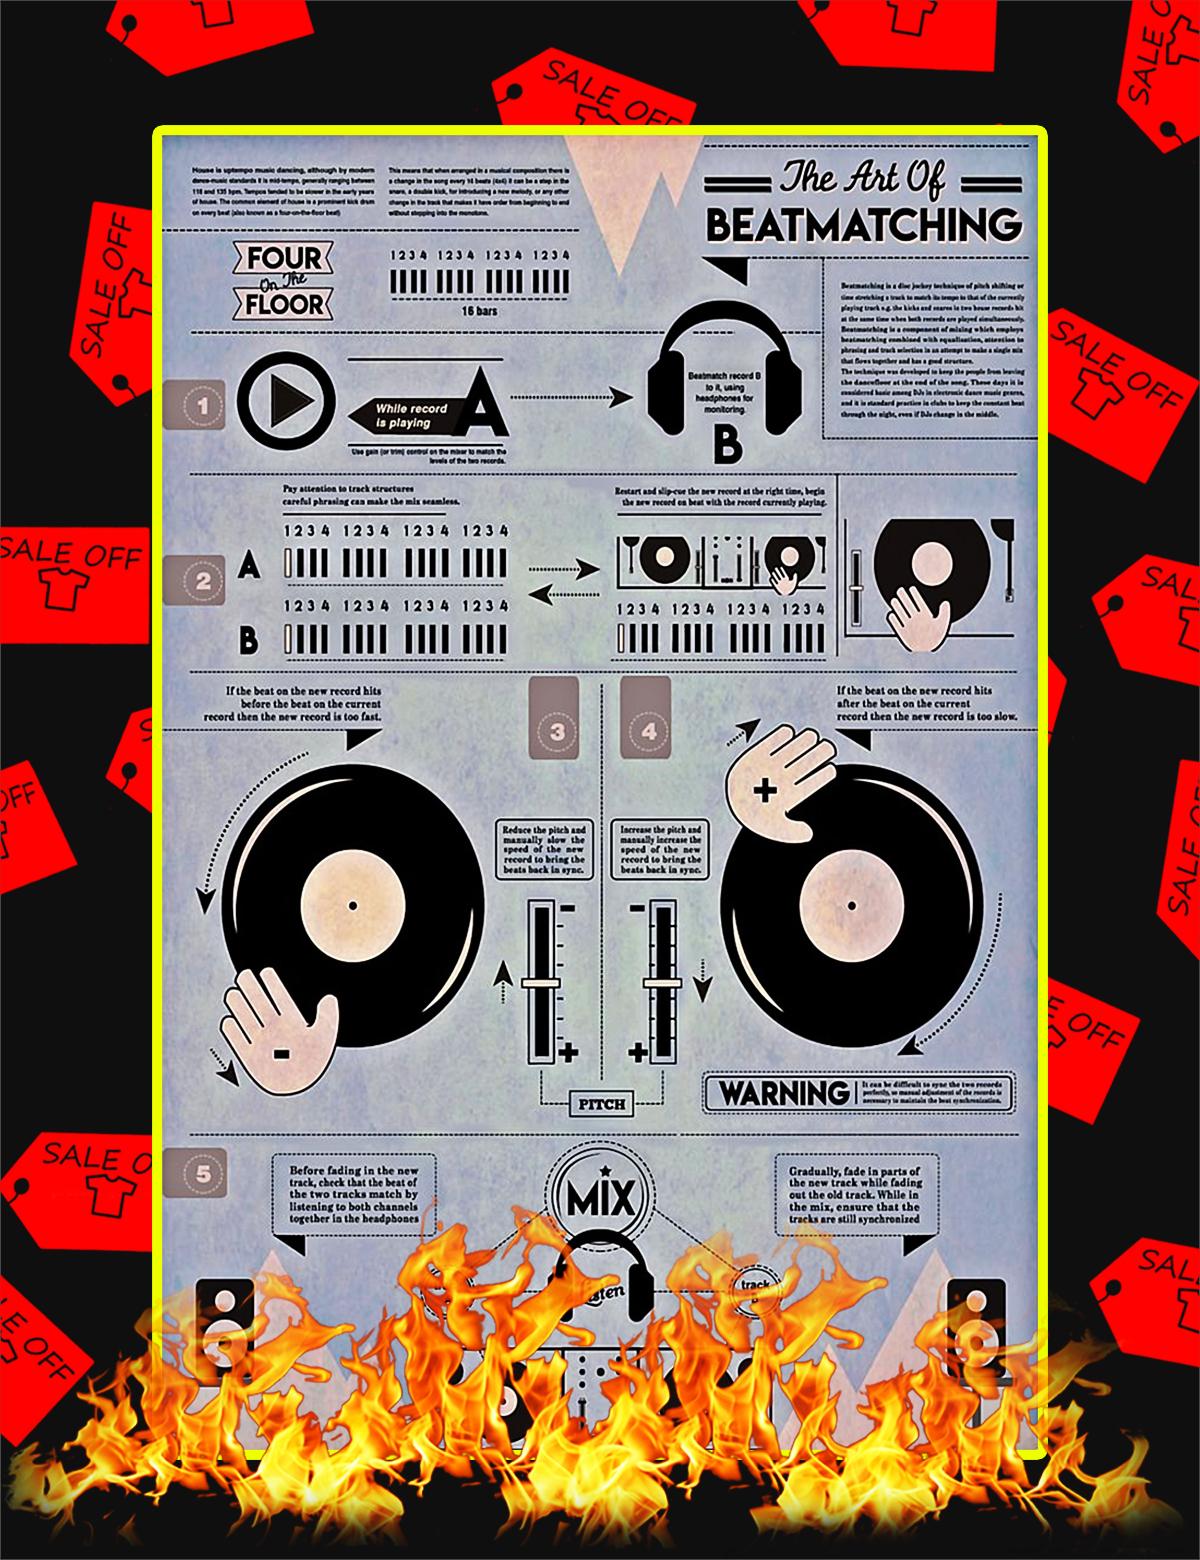 The Art Of Beatmatching Poster - 16x24